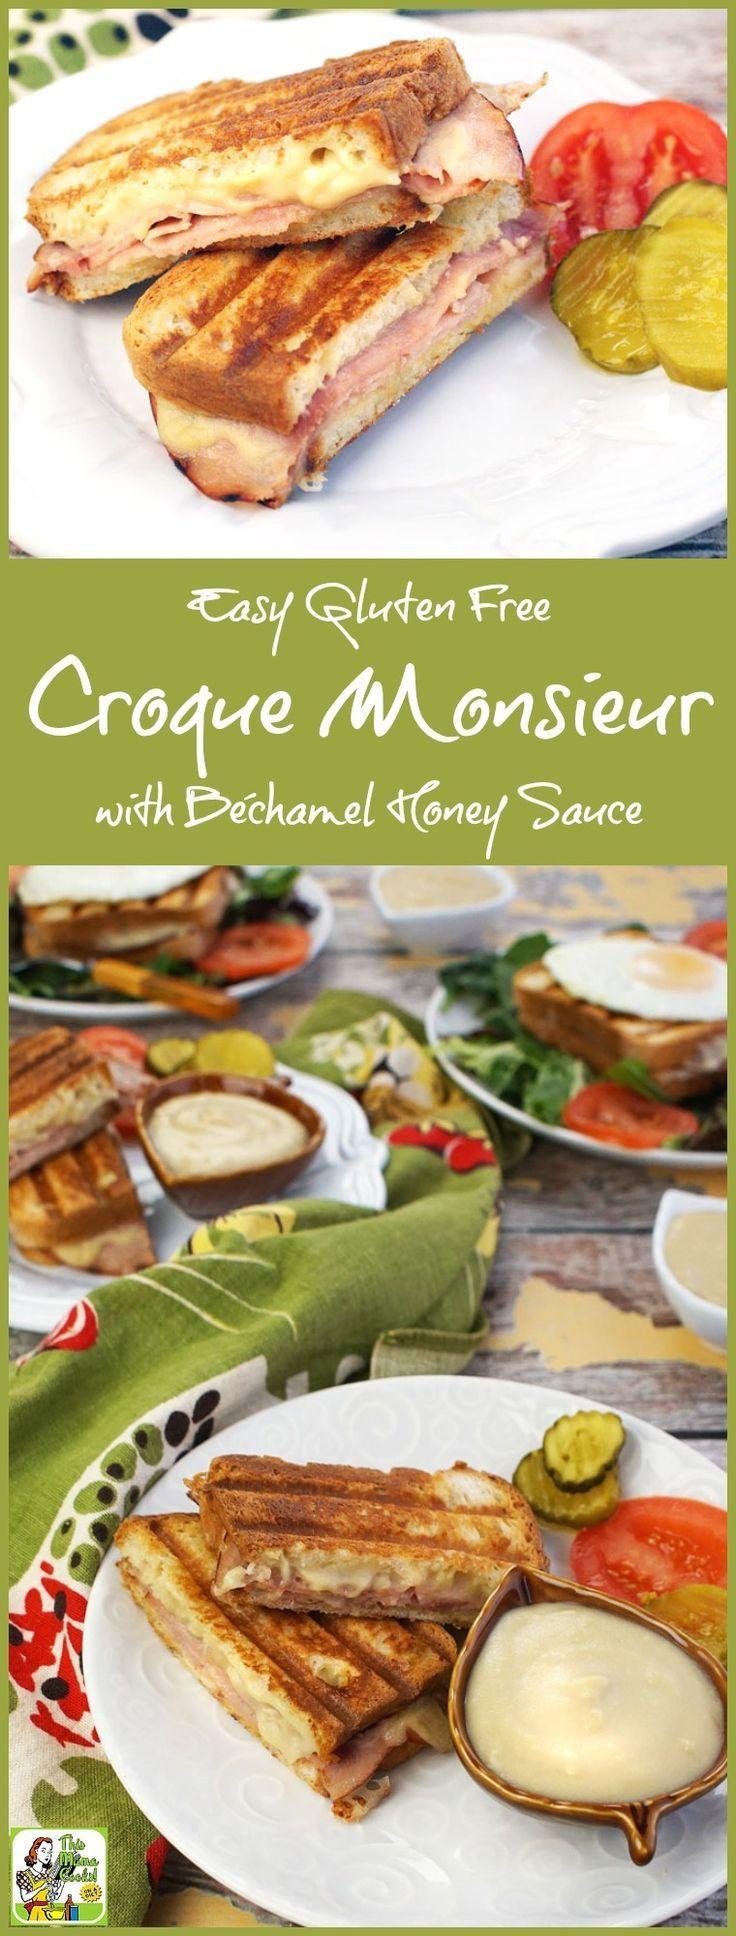 Gluten Free Sauce Recipes  Easy Gluten Free Croque Monsieur with Béchamel Honey Sauce